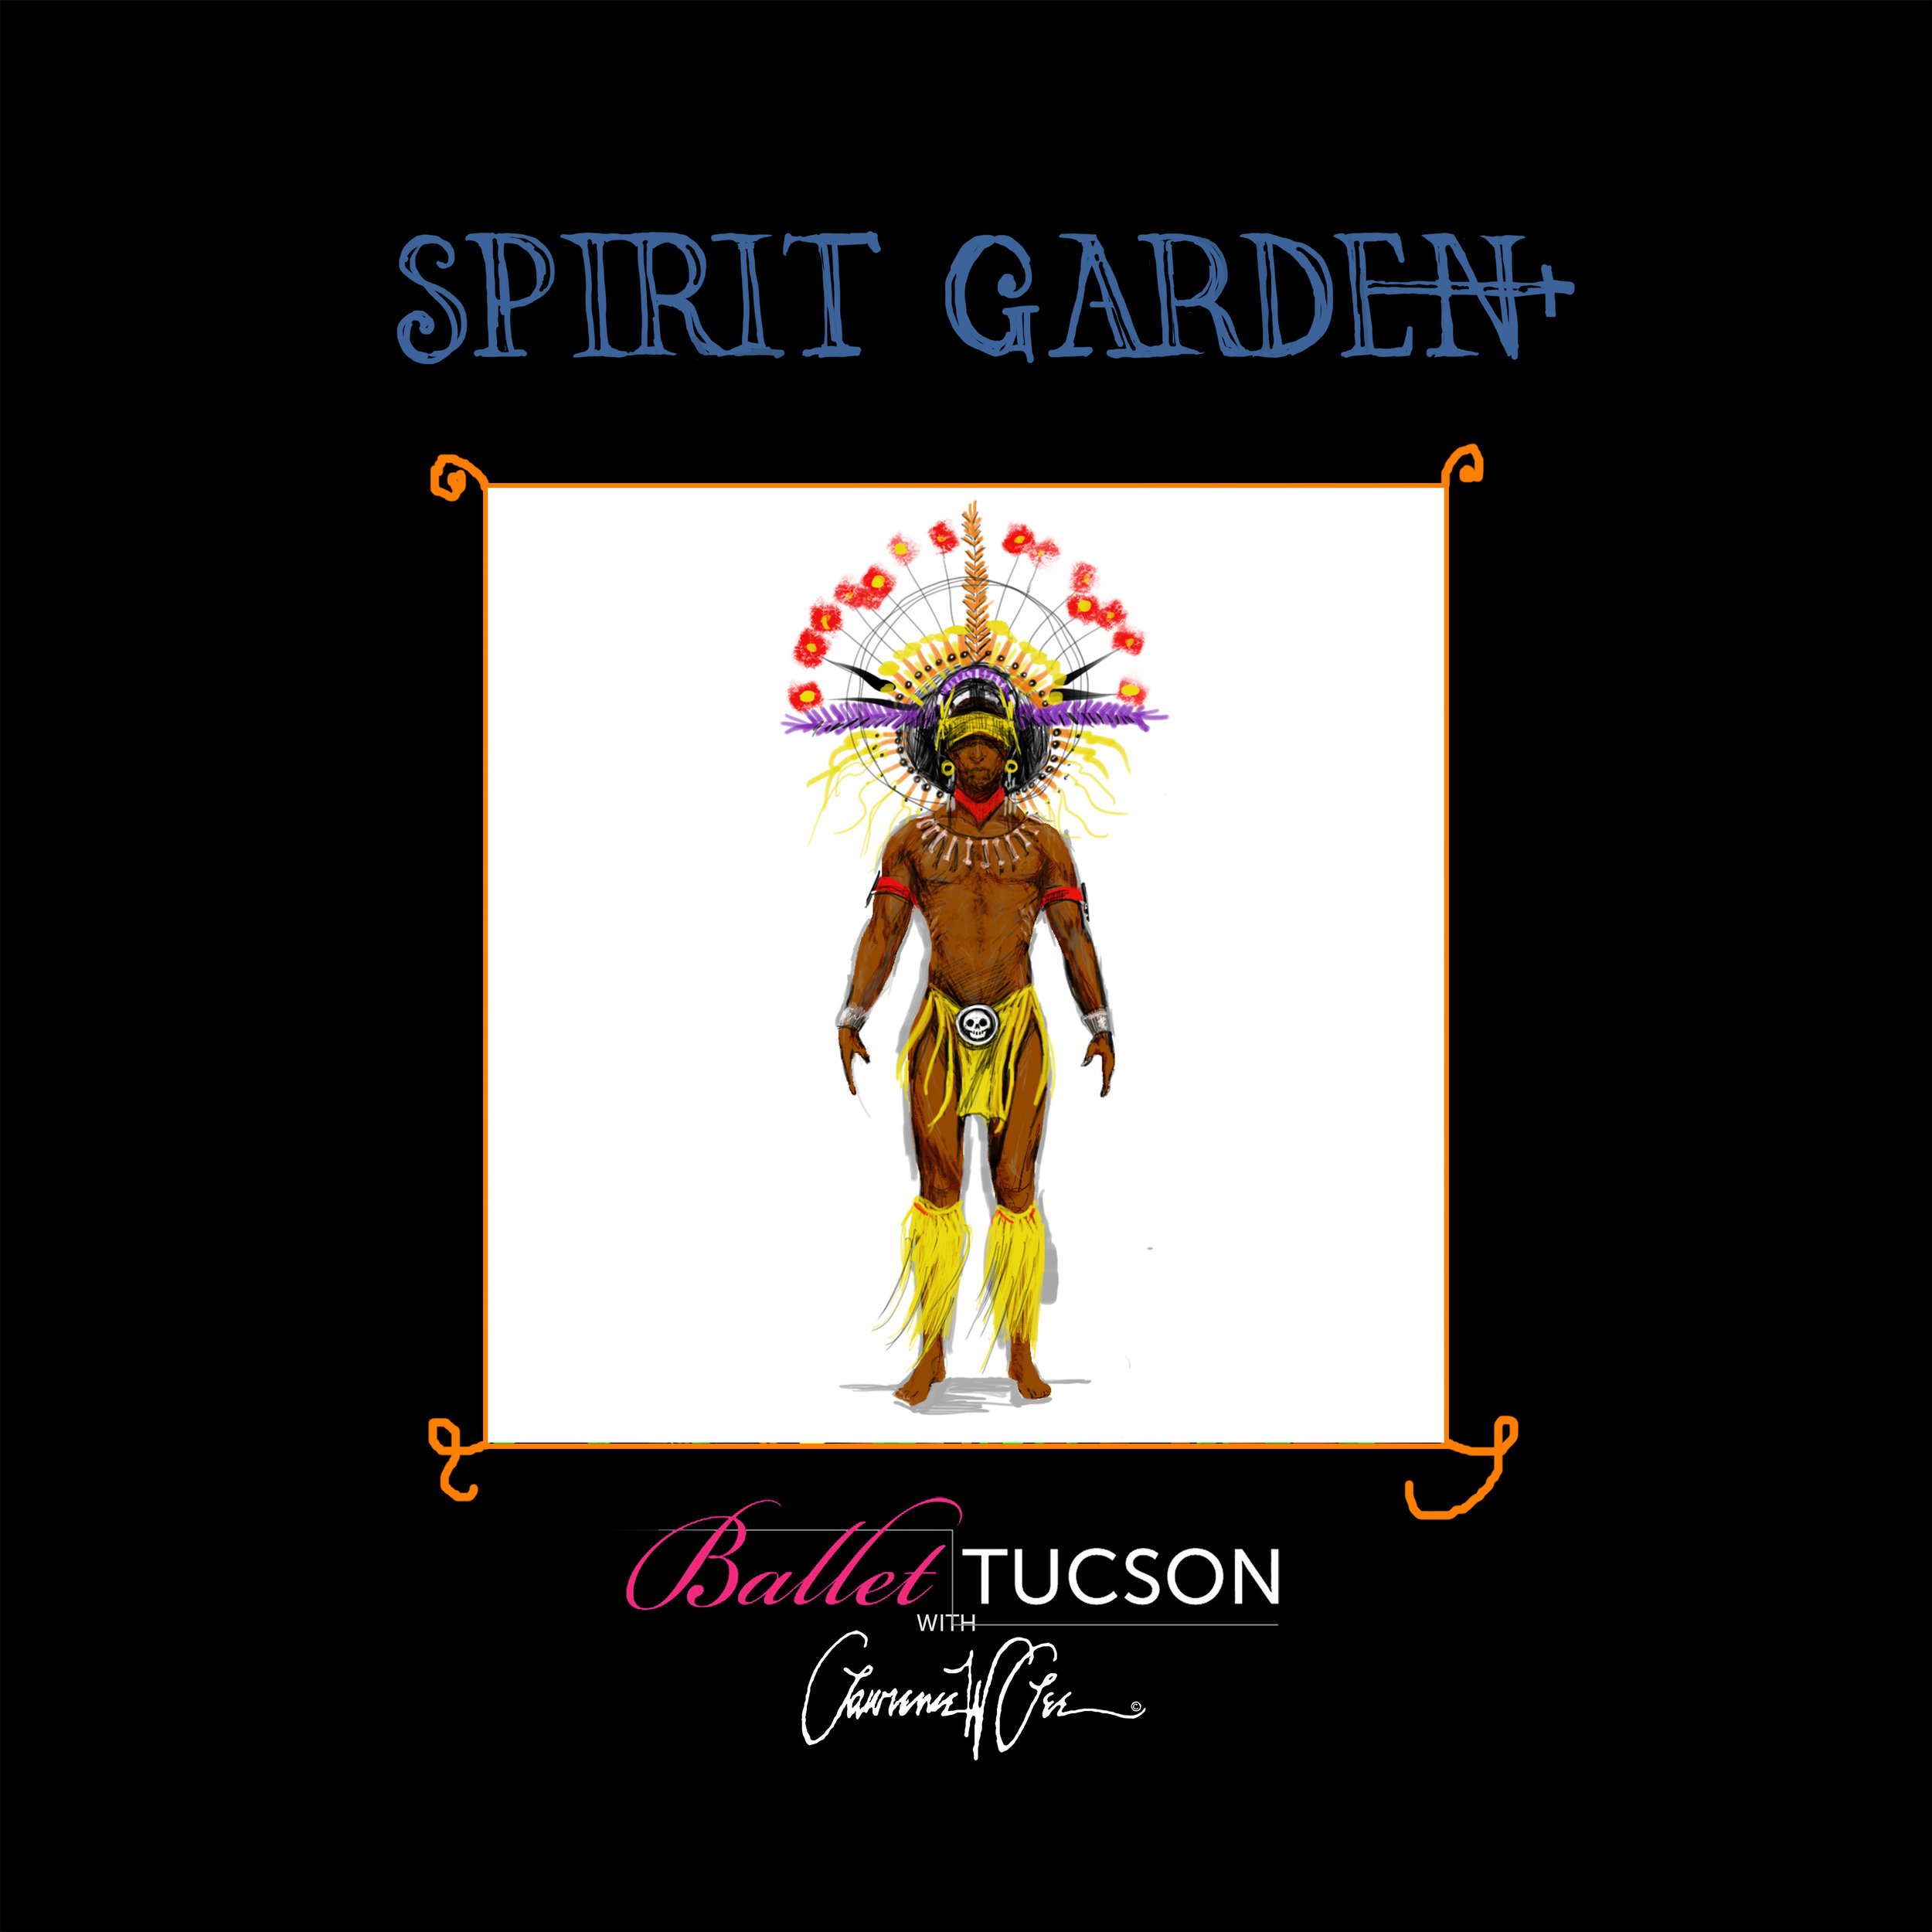 Spirit Garden Costume.jpg